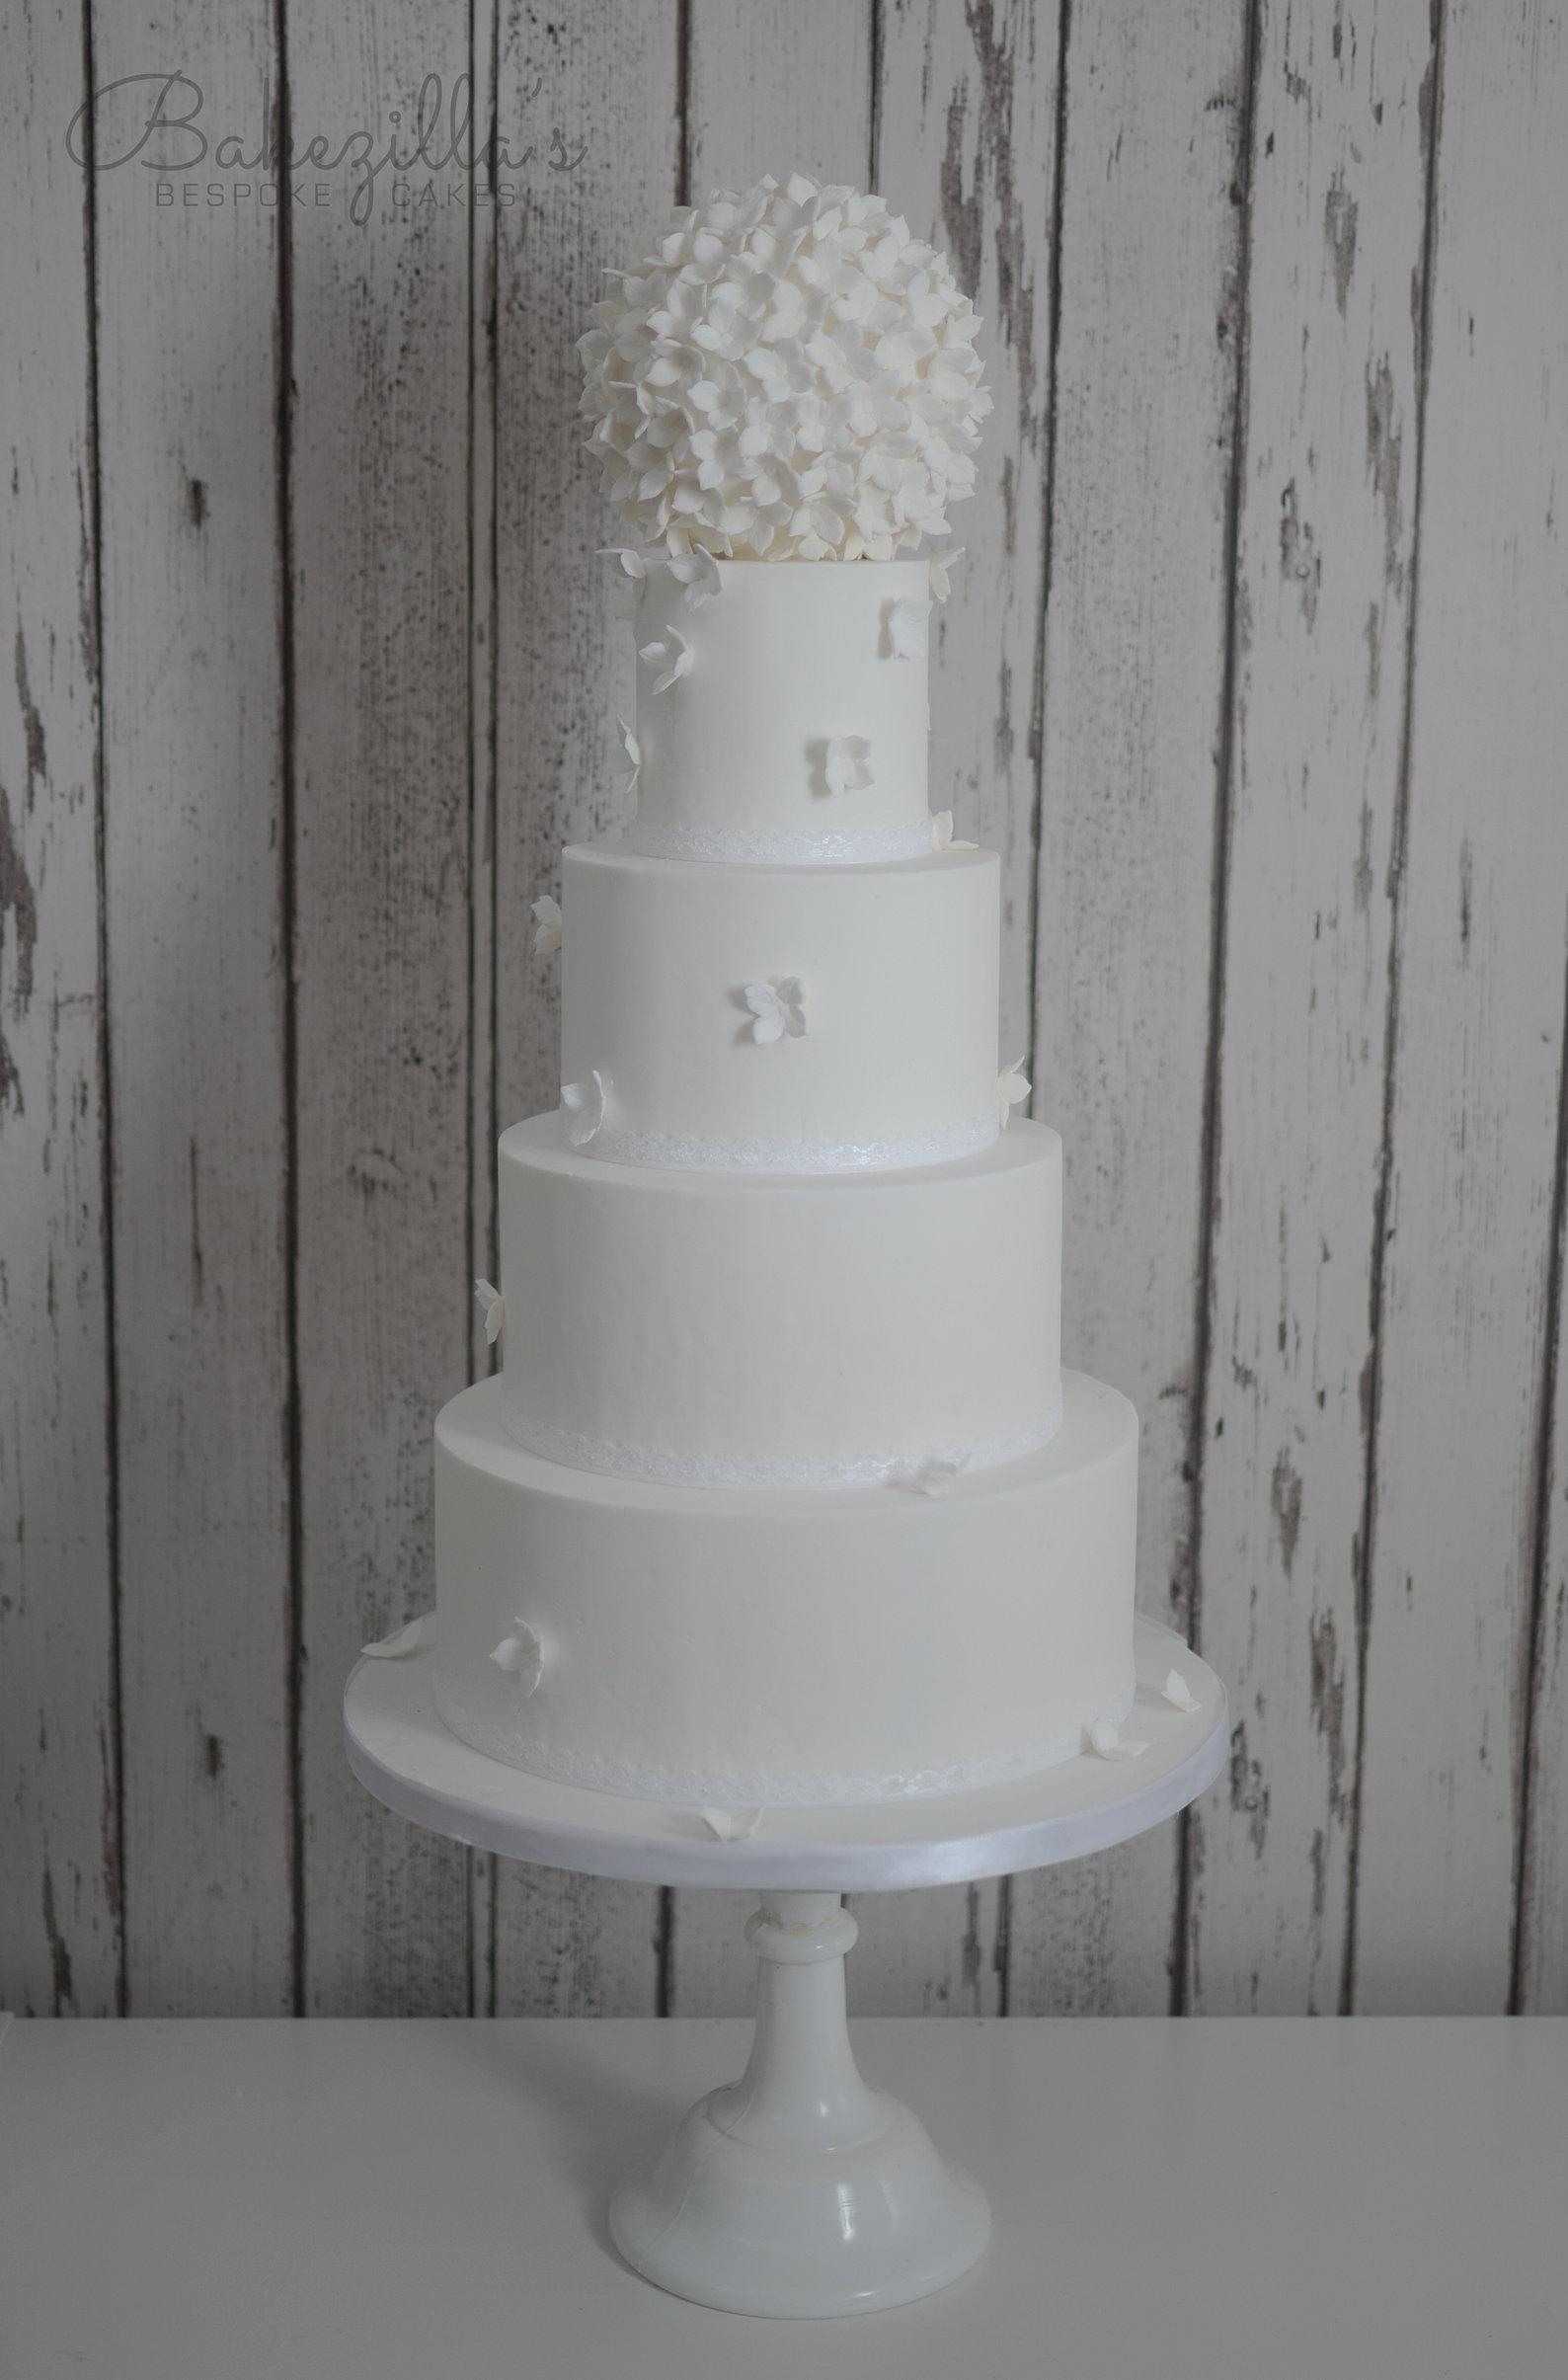 The blue cake company wedding cakes birthday cakes 2016 car release - Wedding Cakes 2016 1 Of 9